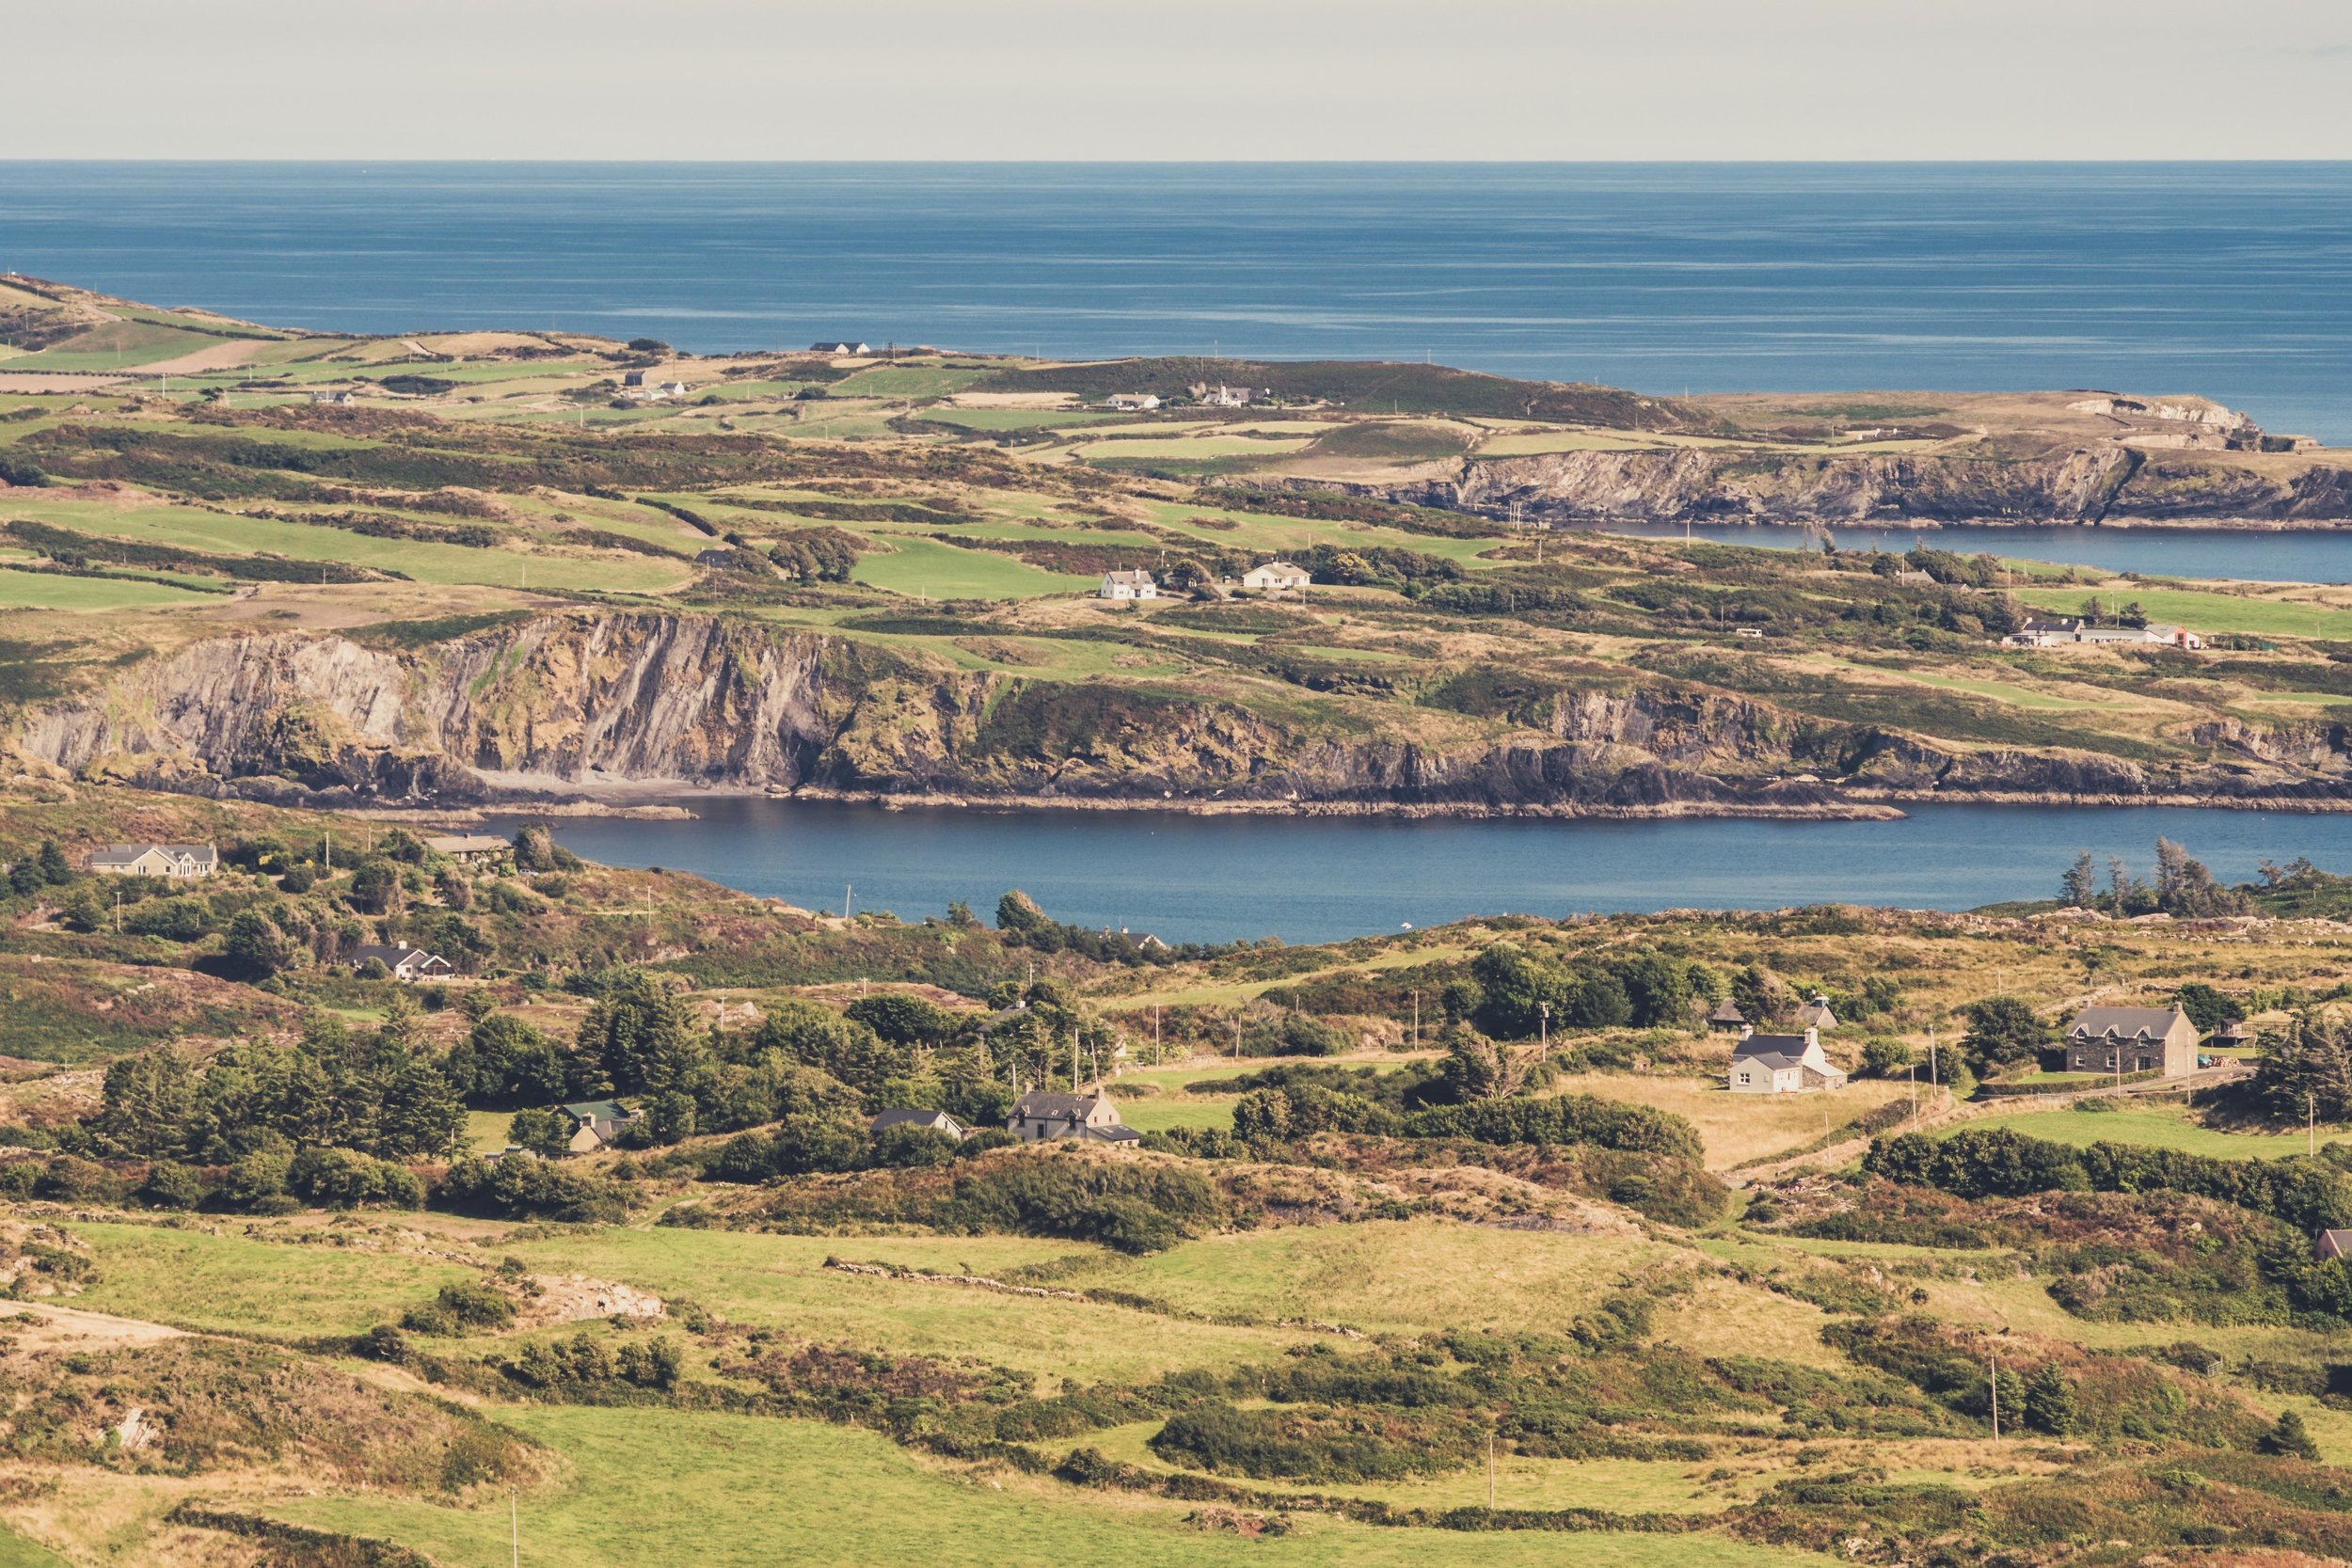 county cork. cork. ireland. irish. history. city. house sitting. old. travel. travel photography. travel photographer. lough hyne. hiking. outdoor. adventure. irish landscape.jpg